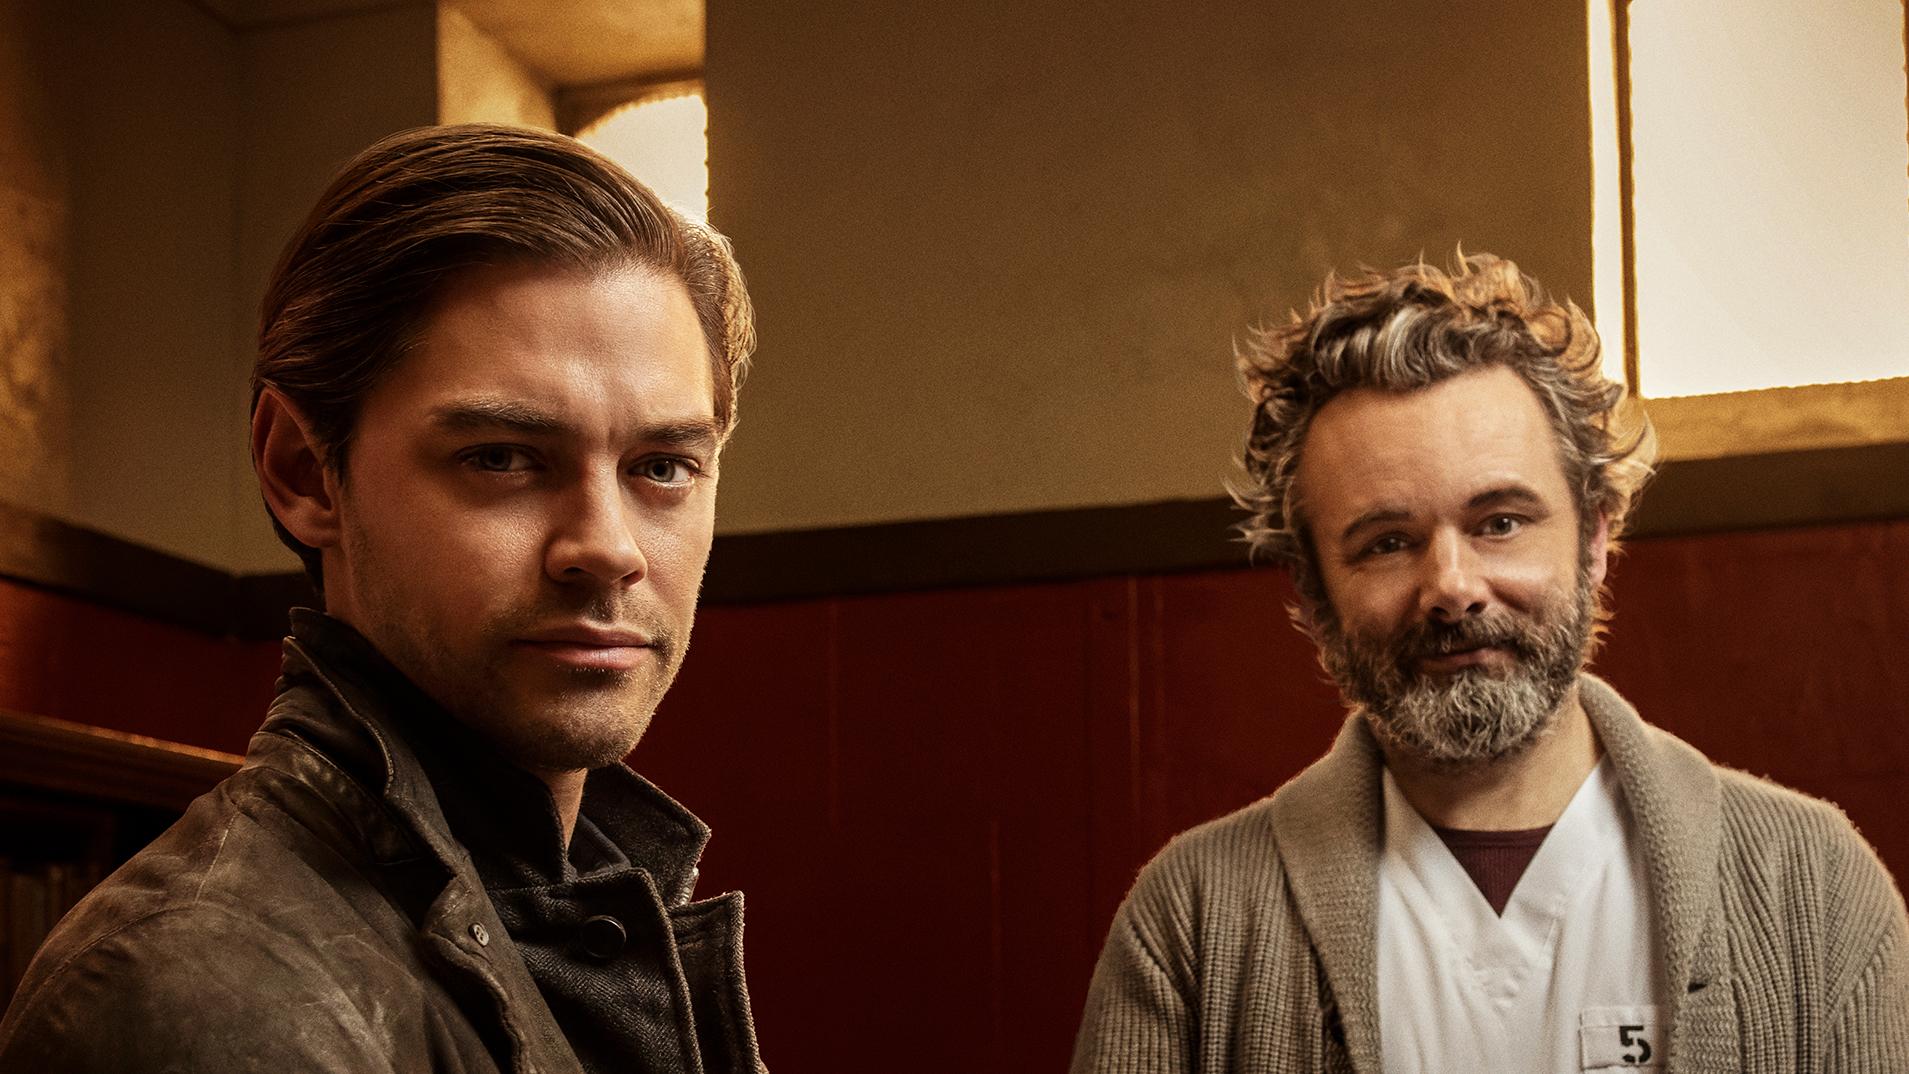 Prodigal Son renewed for Season 2